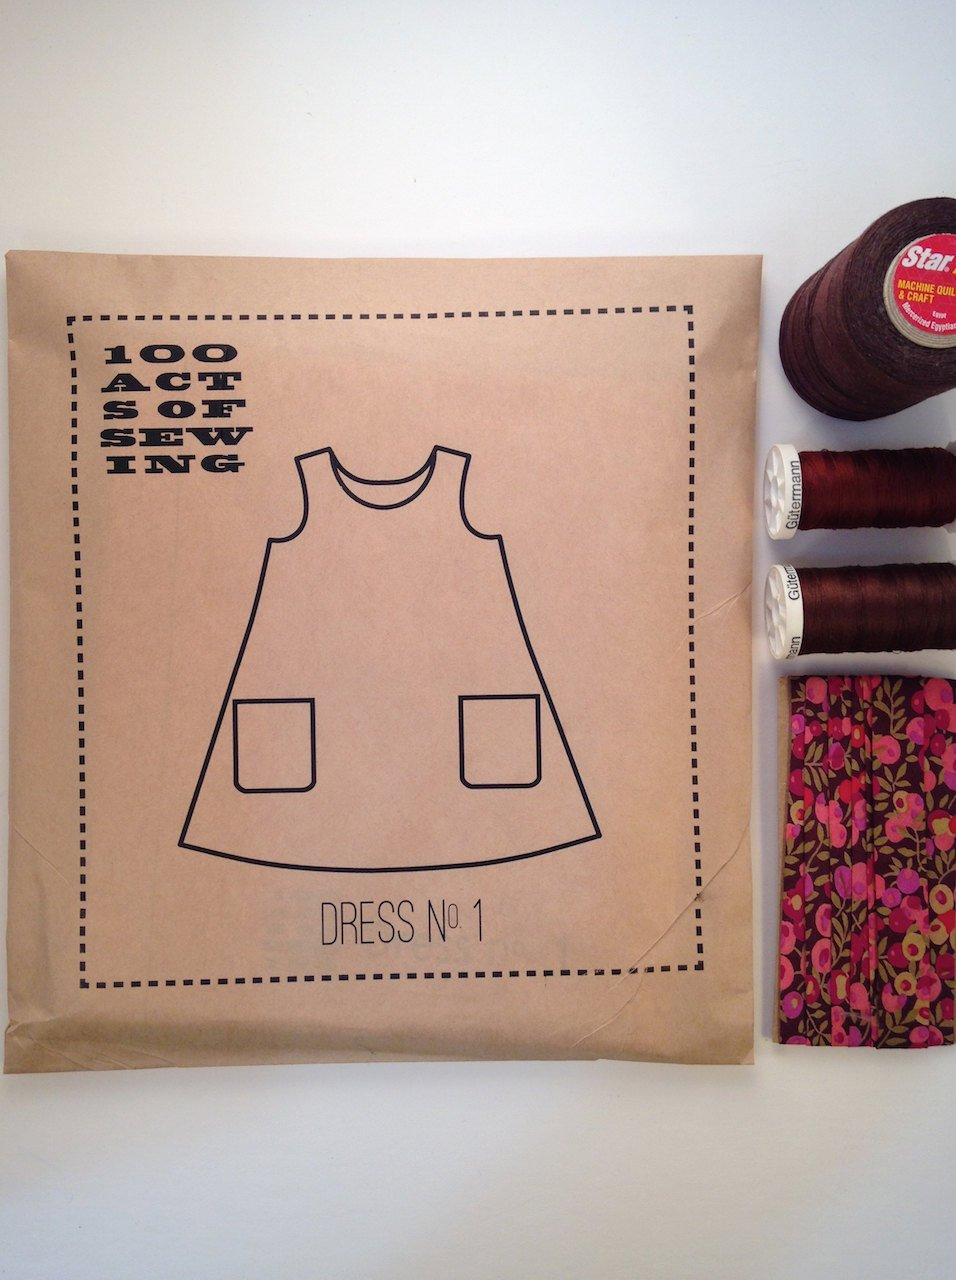 Dress No. 1